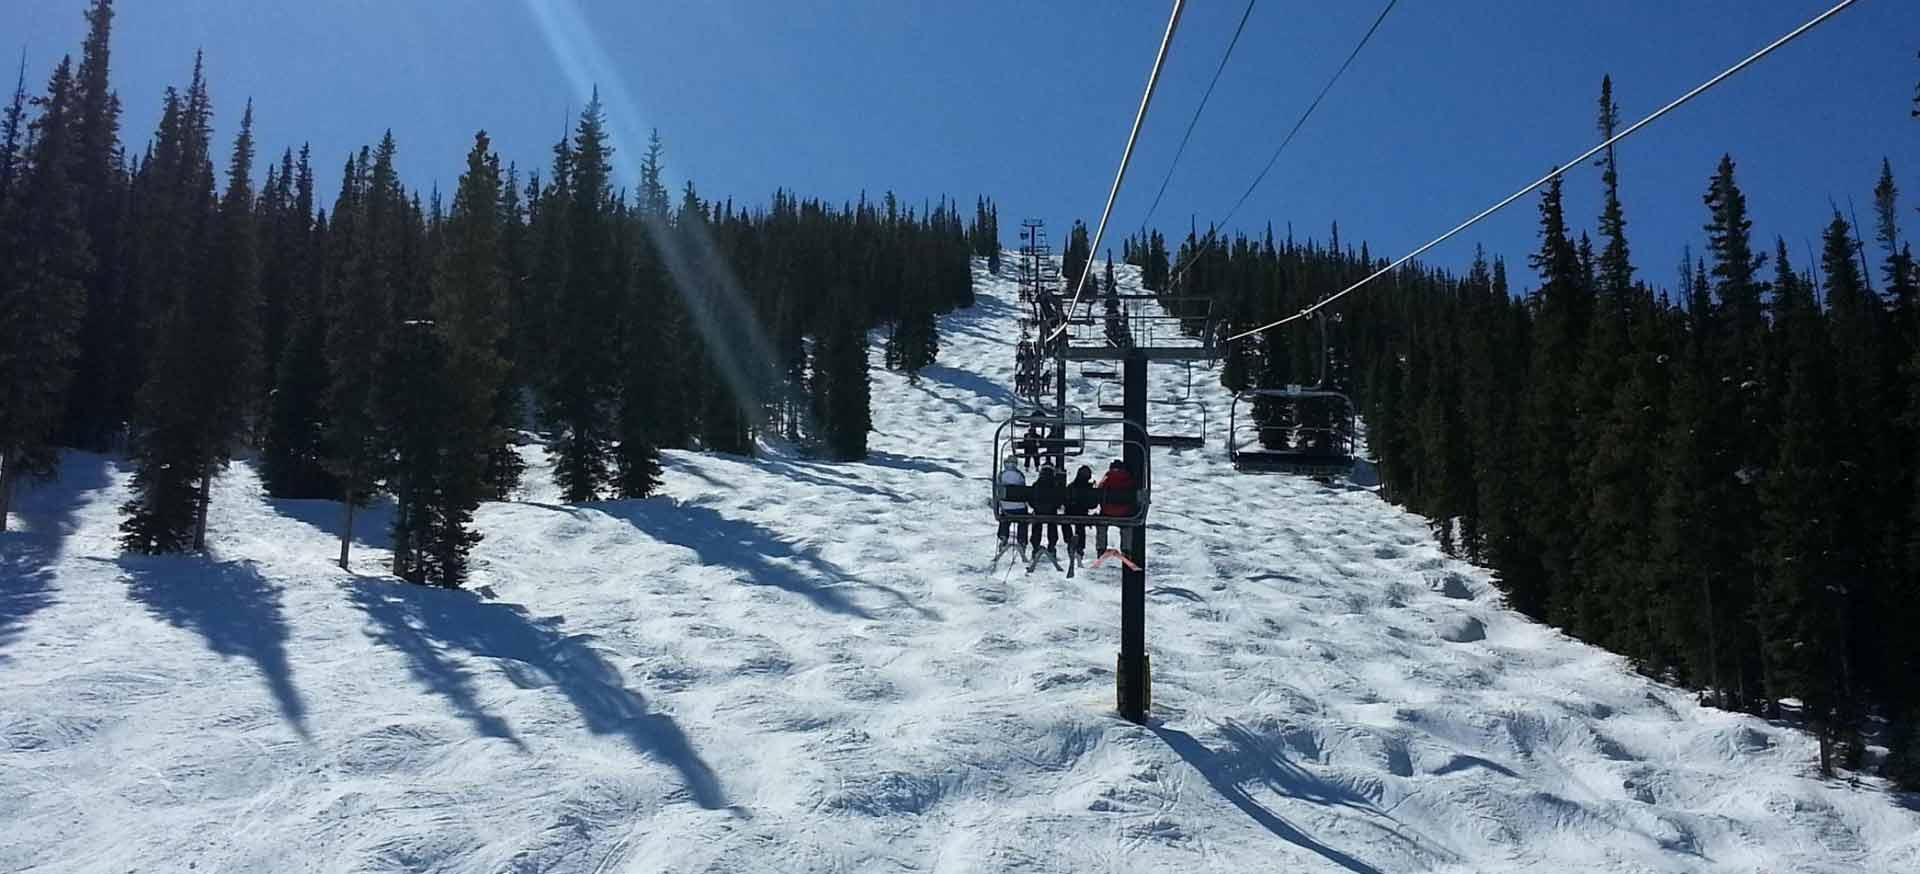 Ski lifts in winter.